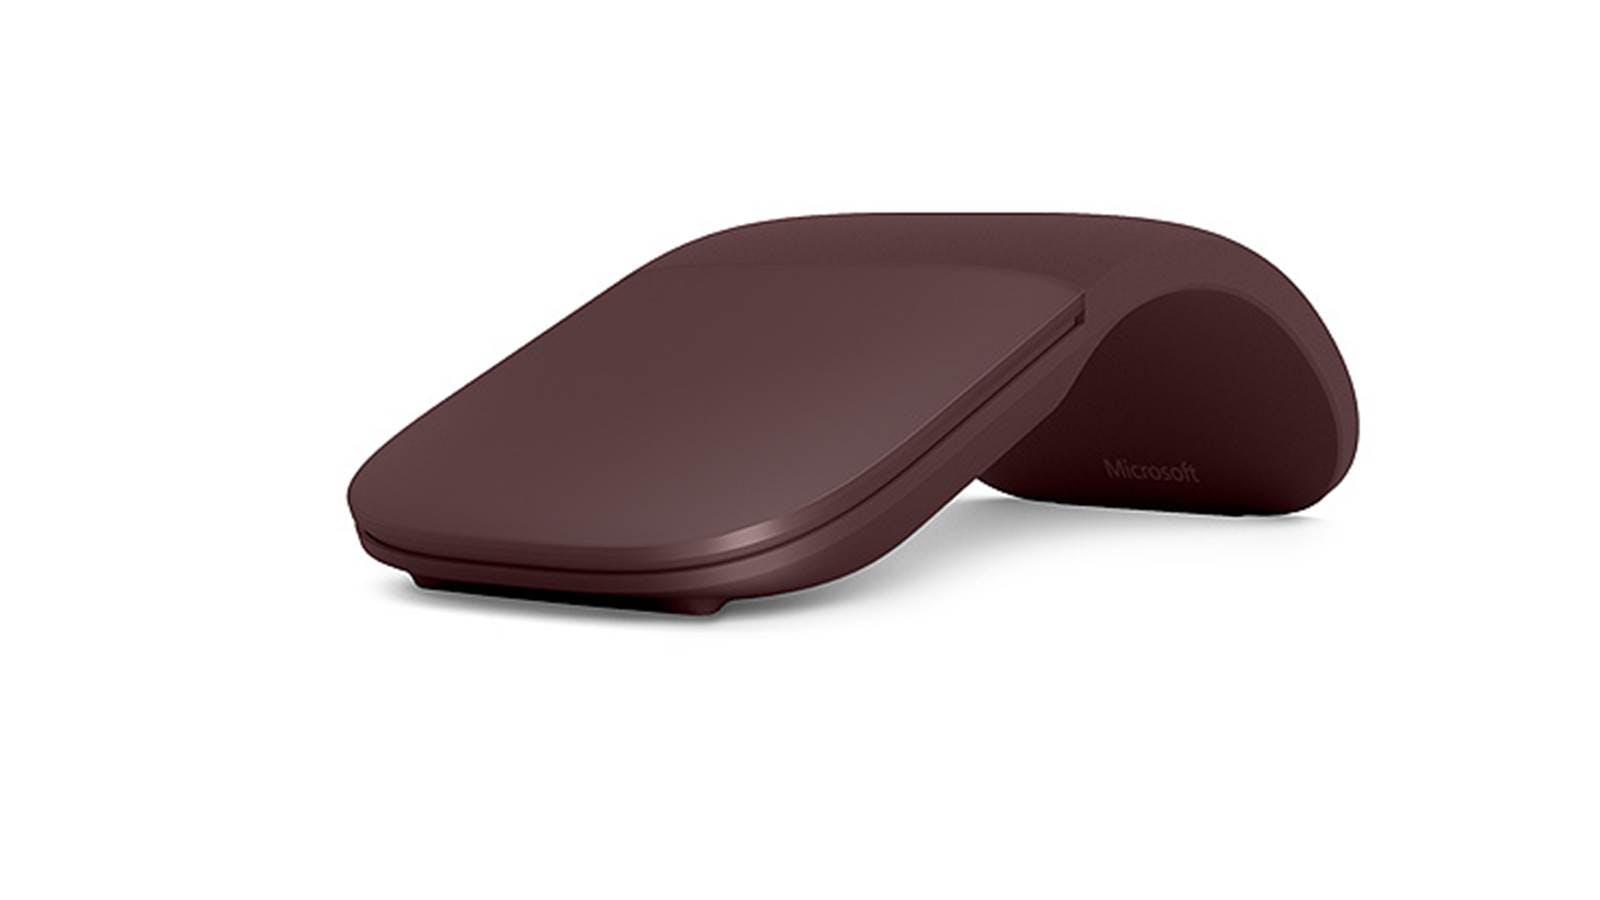 c985f4fd7f2 Microsoft Surface Arc Mouse - Burgundy   Harvey Norman Malaysia